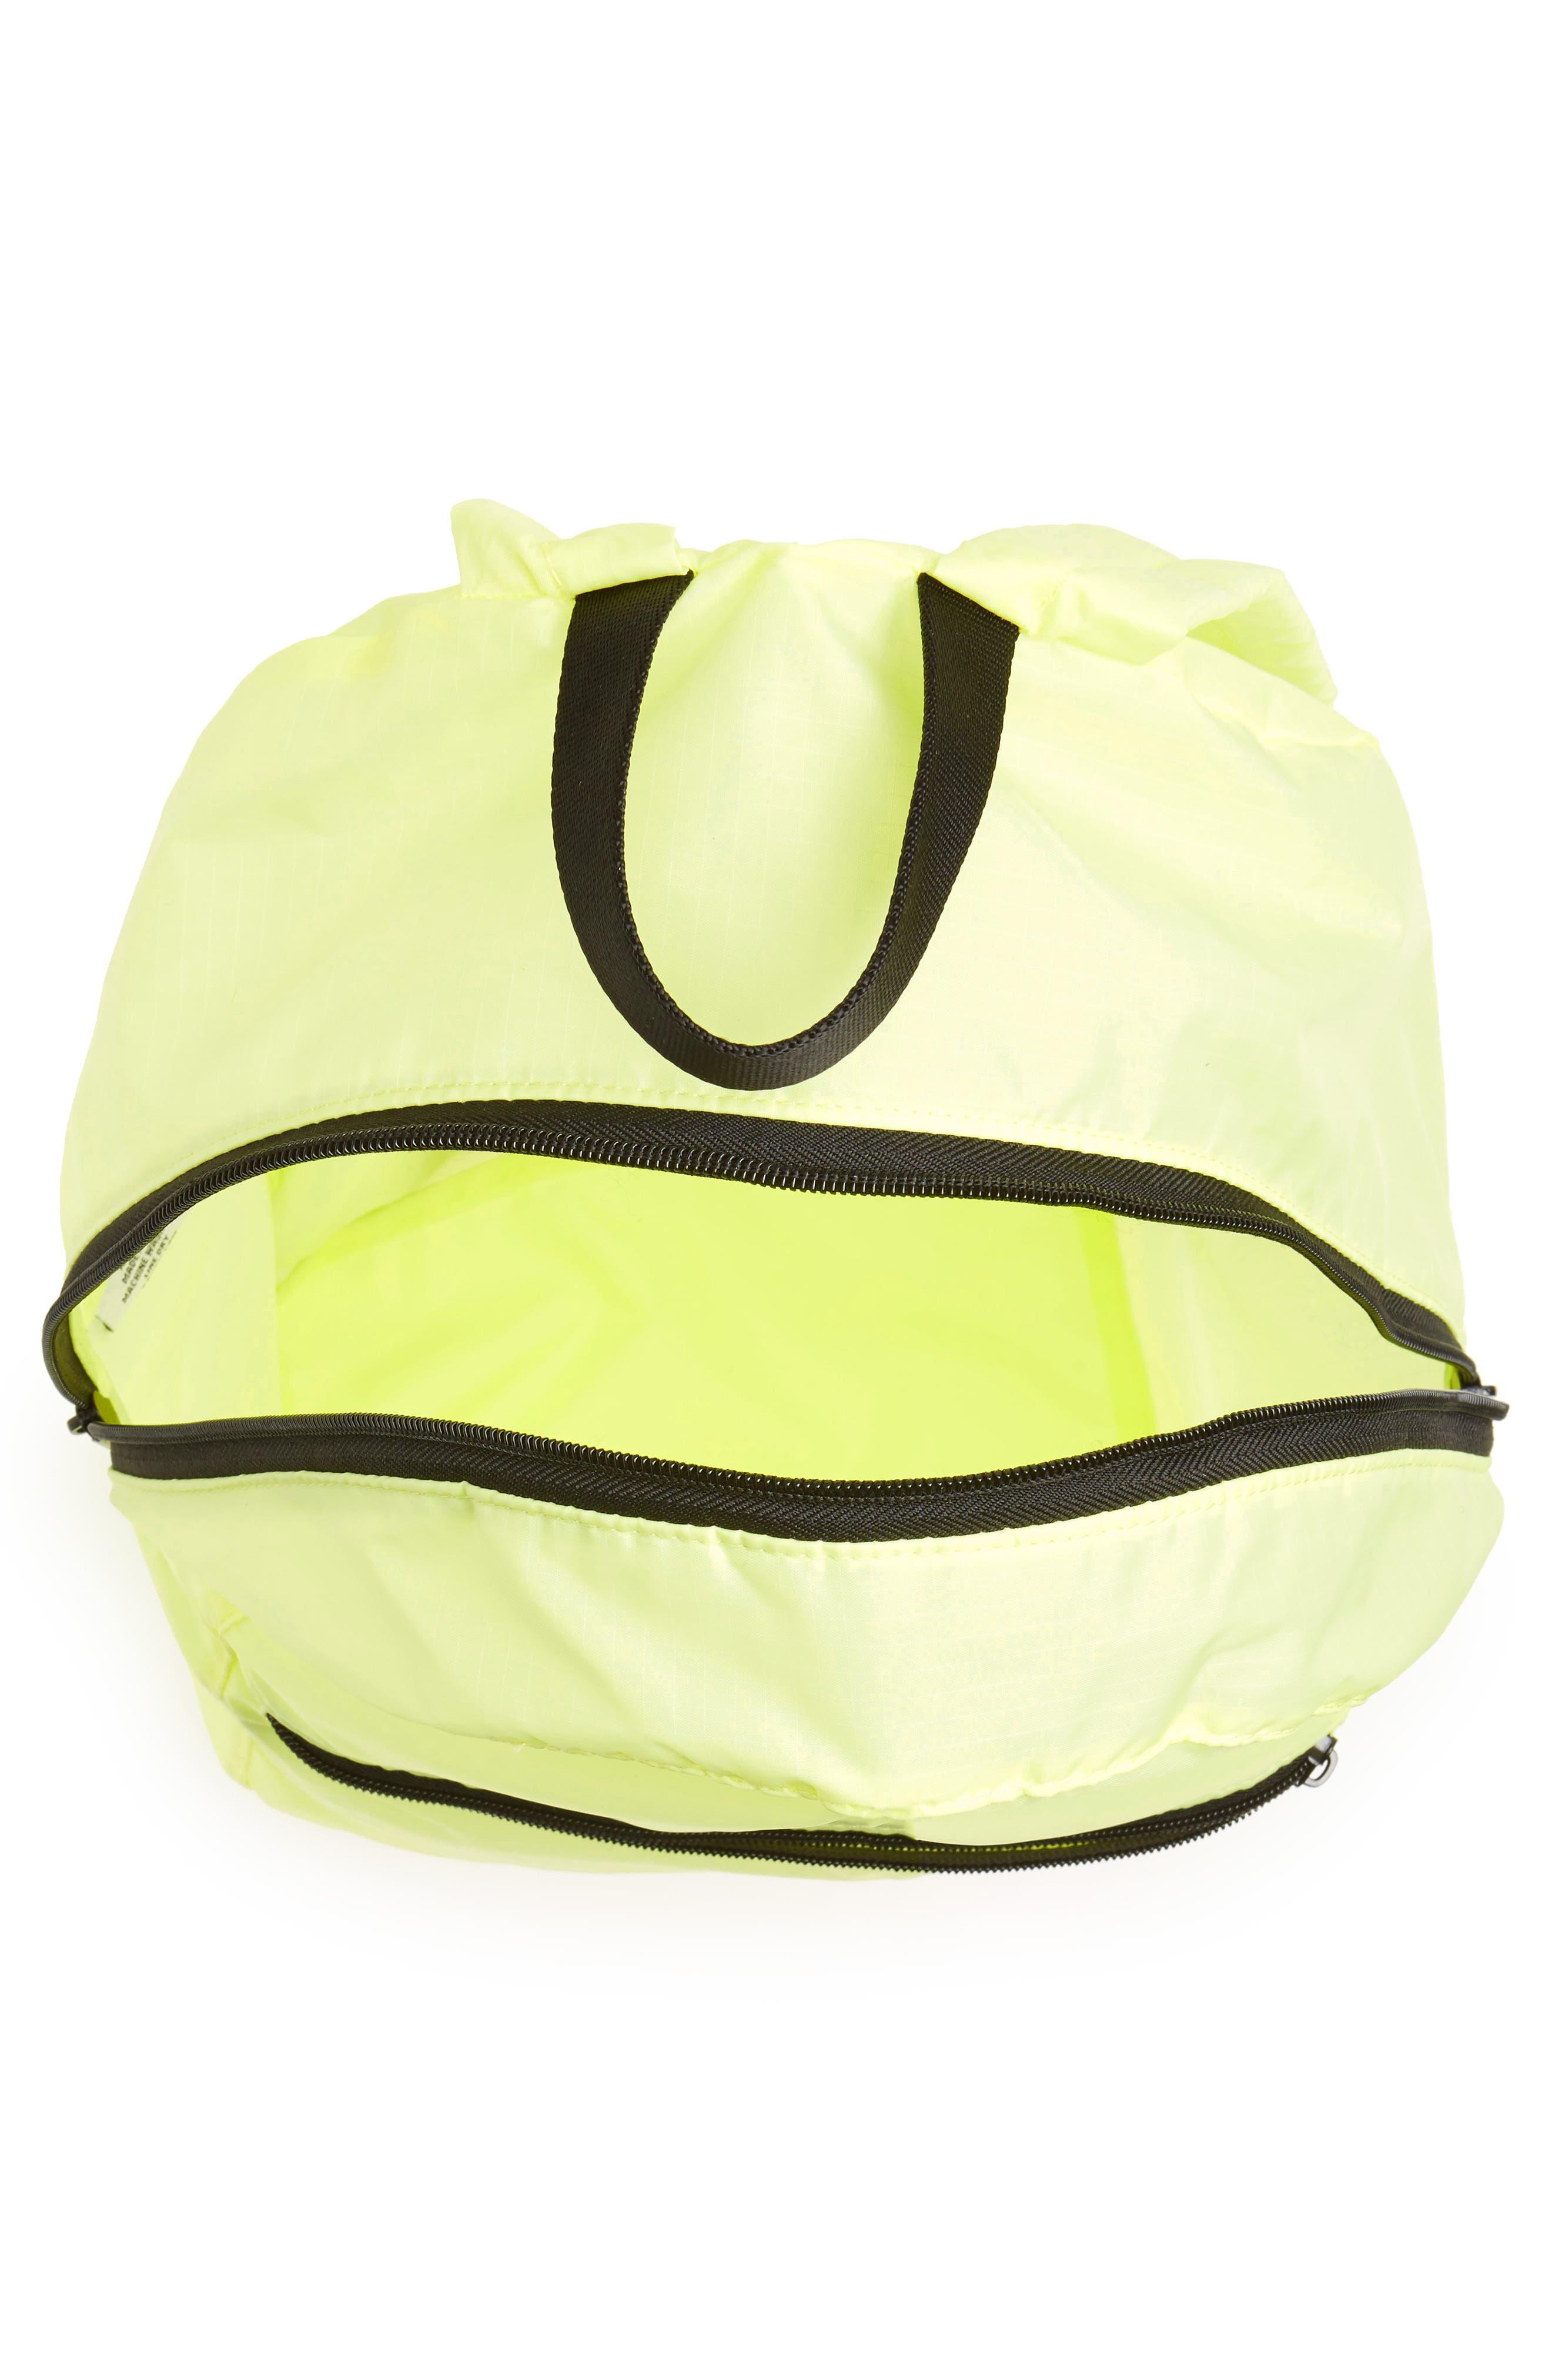 Ripstop Nylon Backpack,                             Alternate thumbnail 16, color,